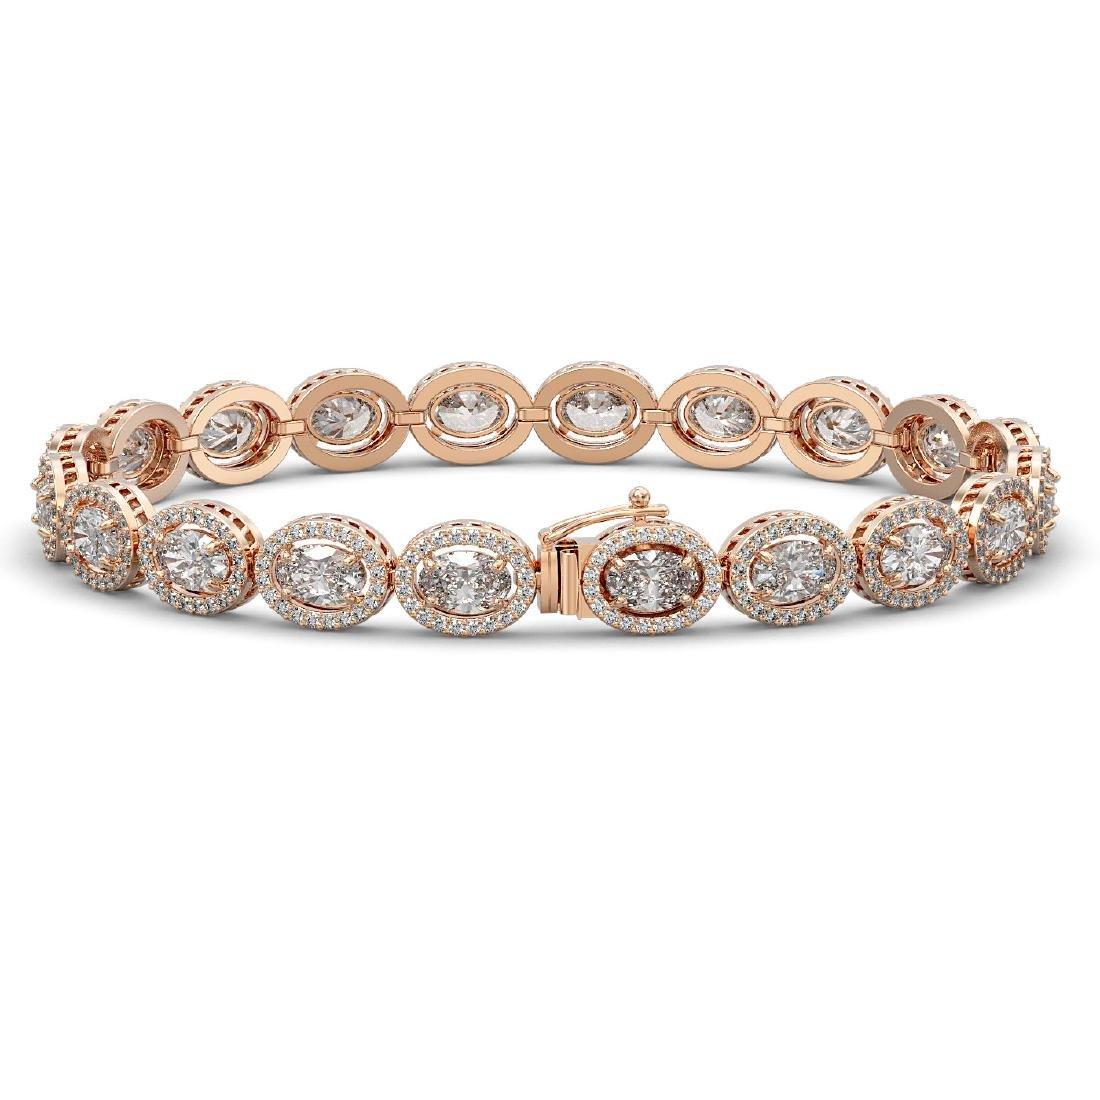 13.25 CTW Oval Diamond Designer Bracelet 18K Rose Gold - 2